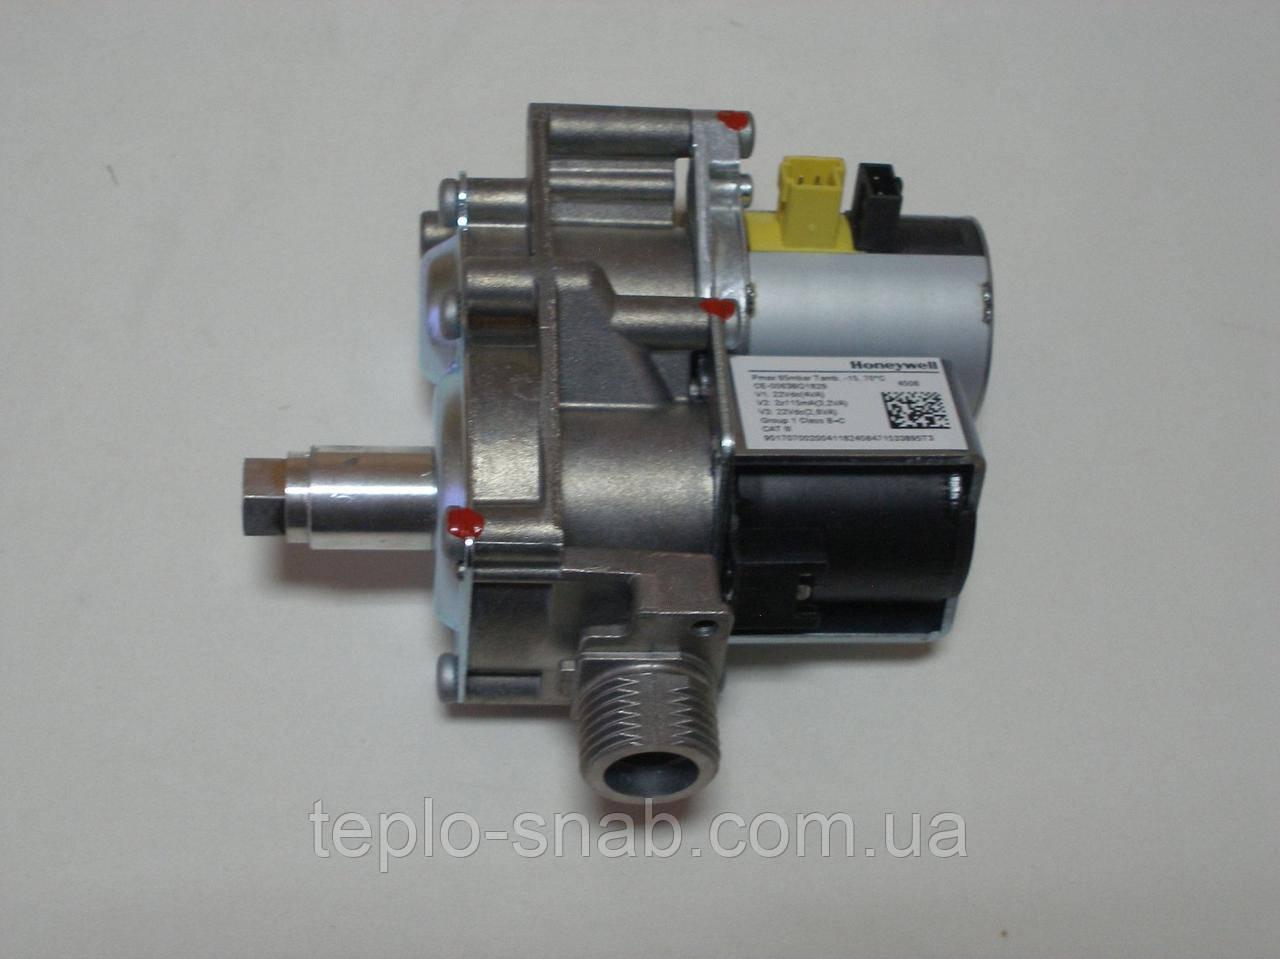 Газовый клапан Honeywell VK8515MR4506U. SAUNIER DUVAL 0020039187. Vaillant 0020053968. Protherm 0020049296